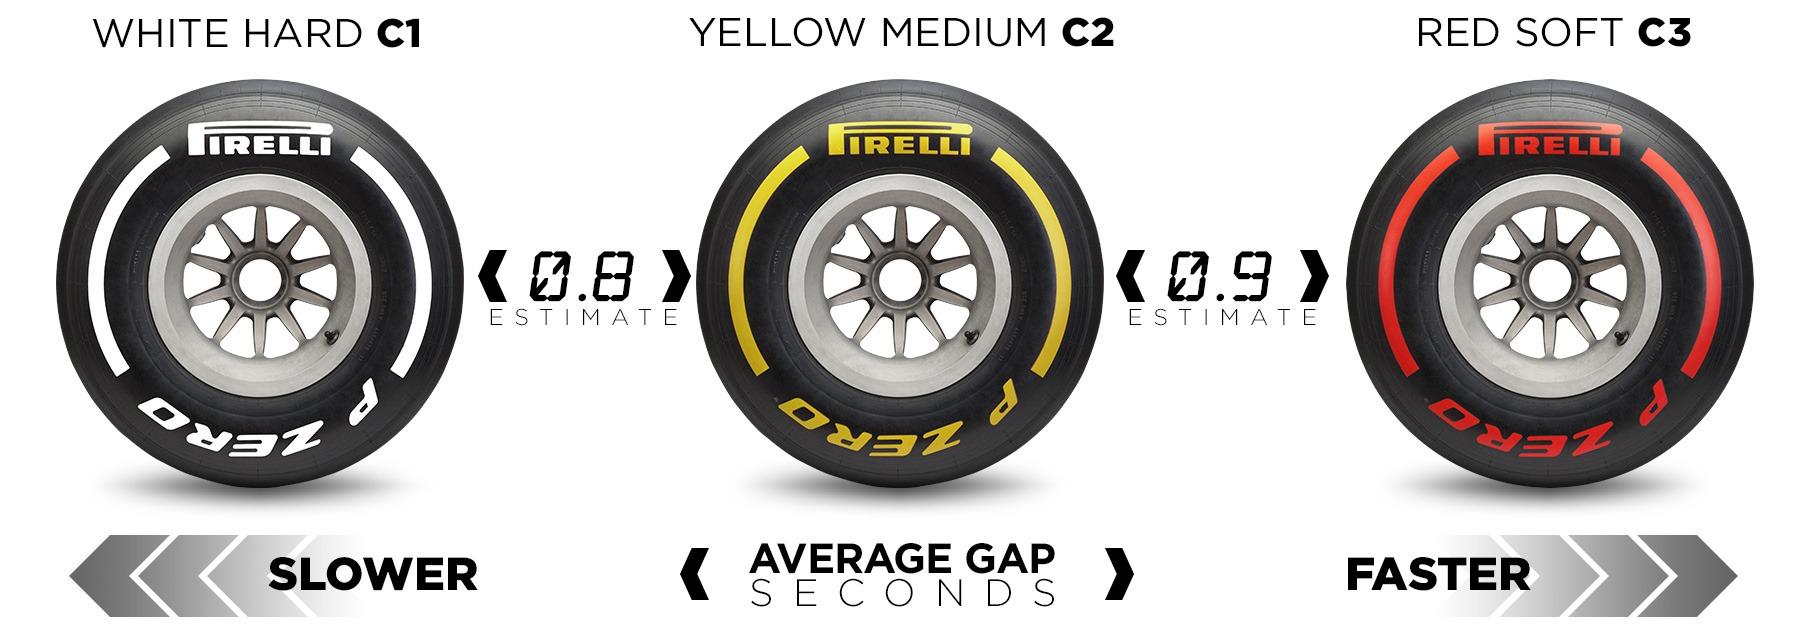 2020 Turkish F1 GP Race Strategy